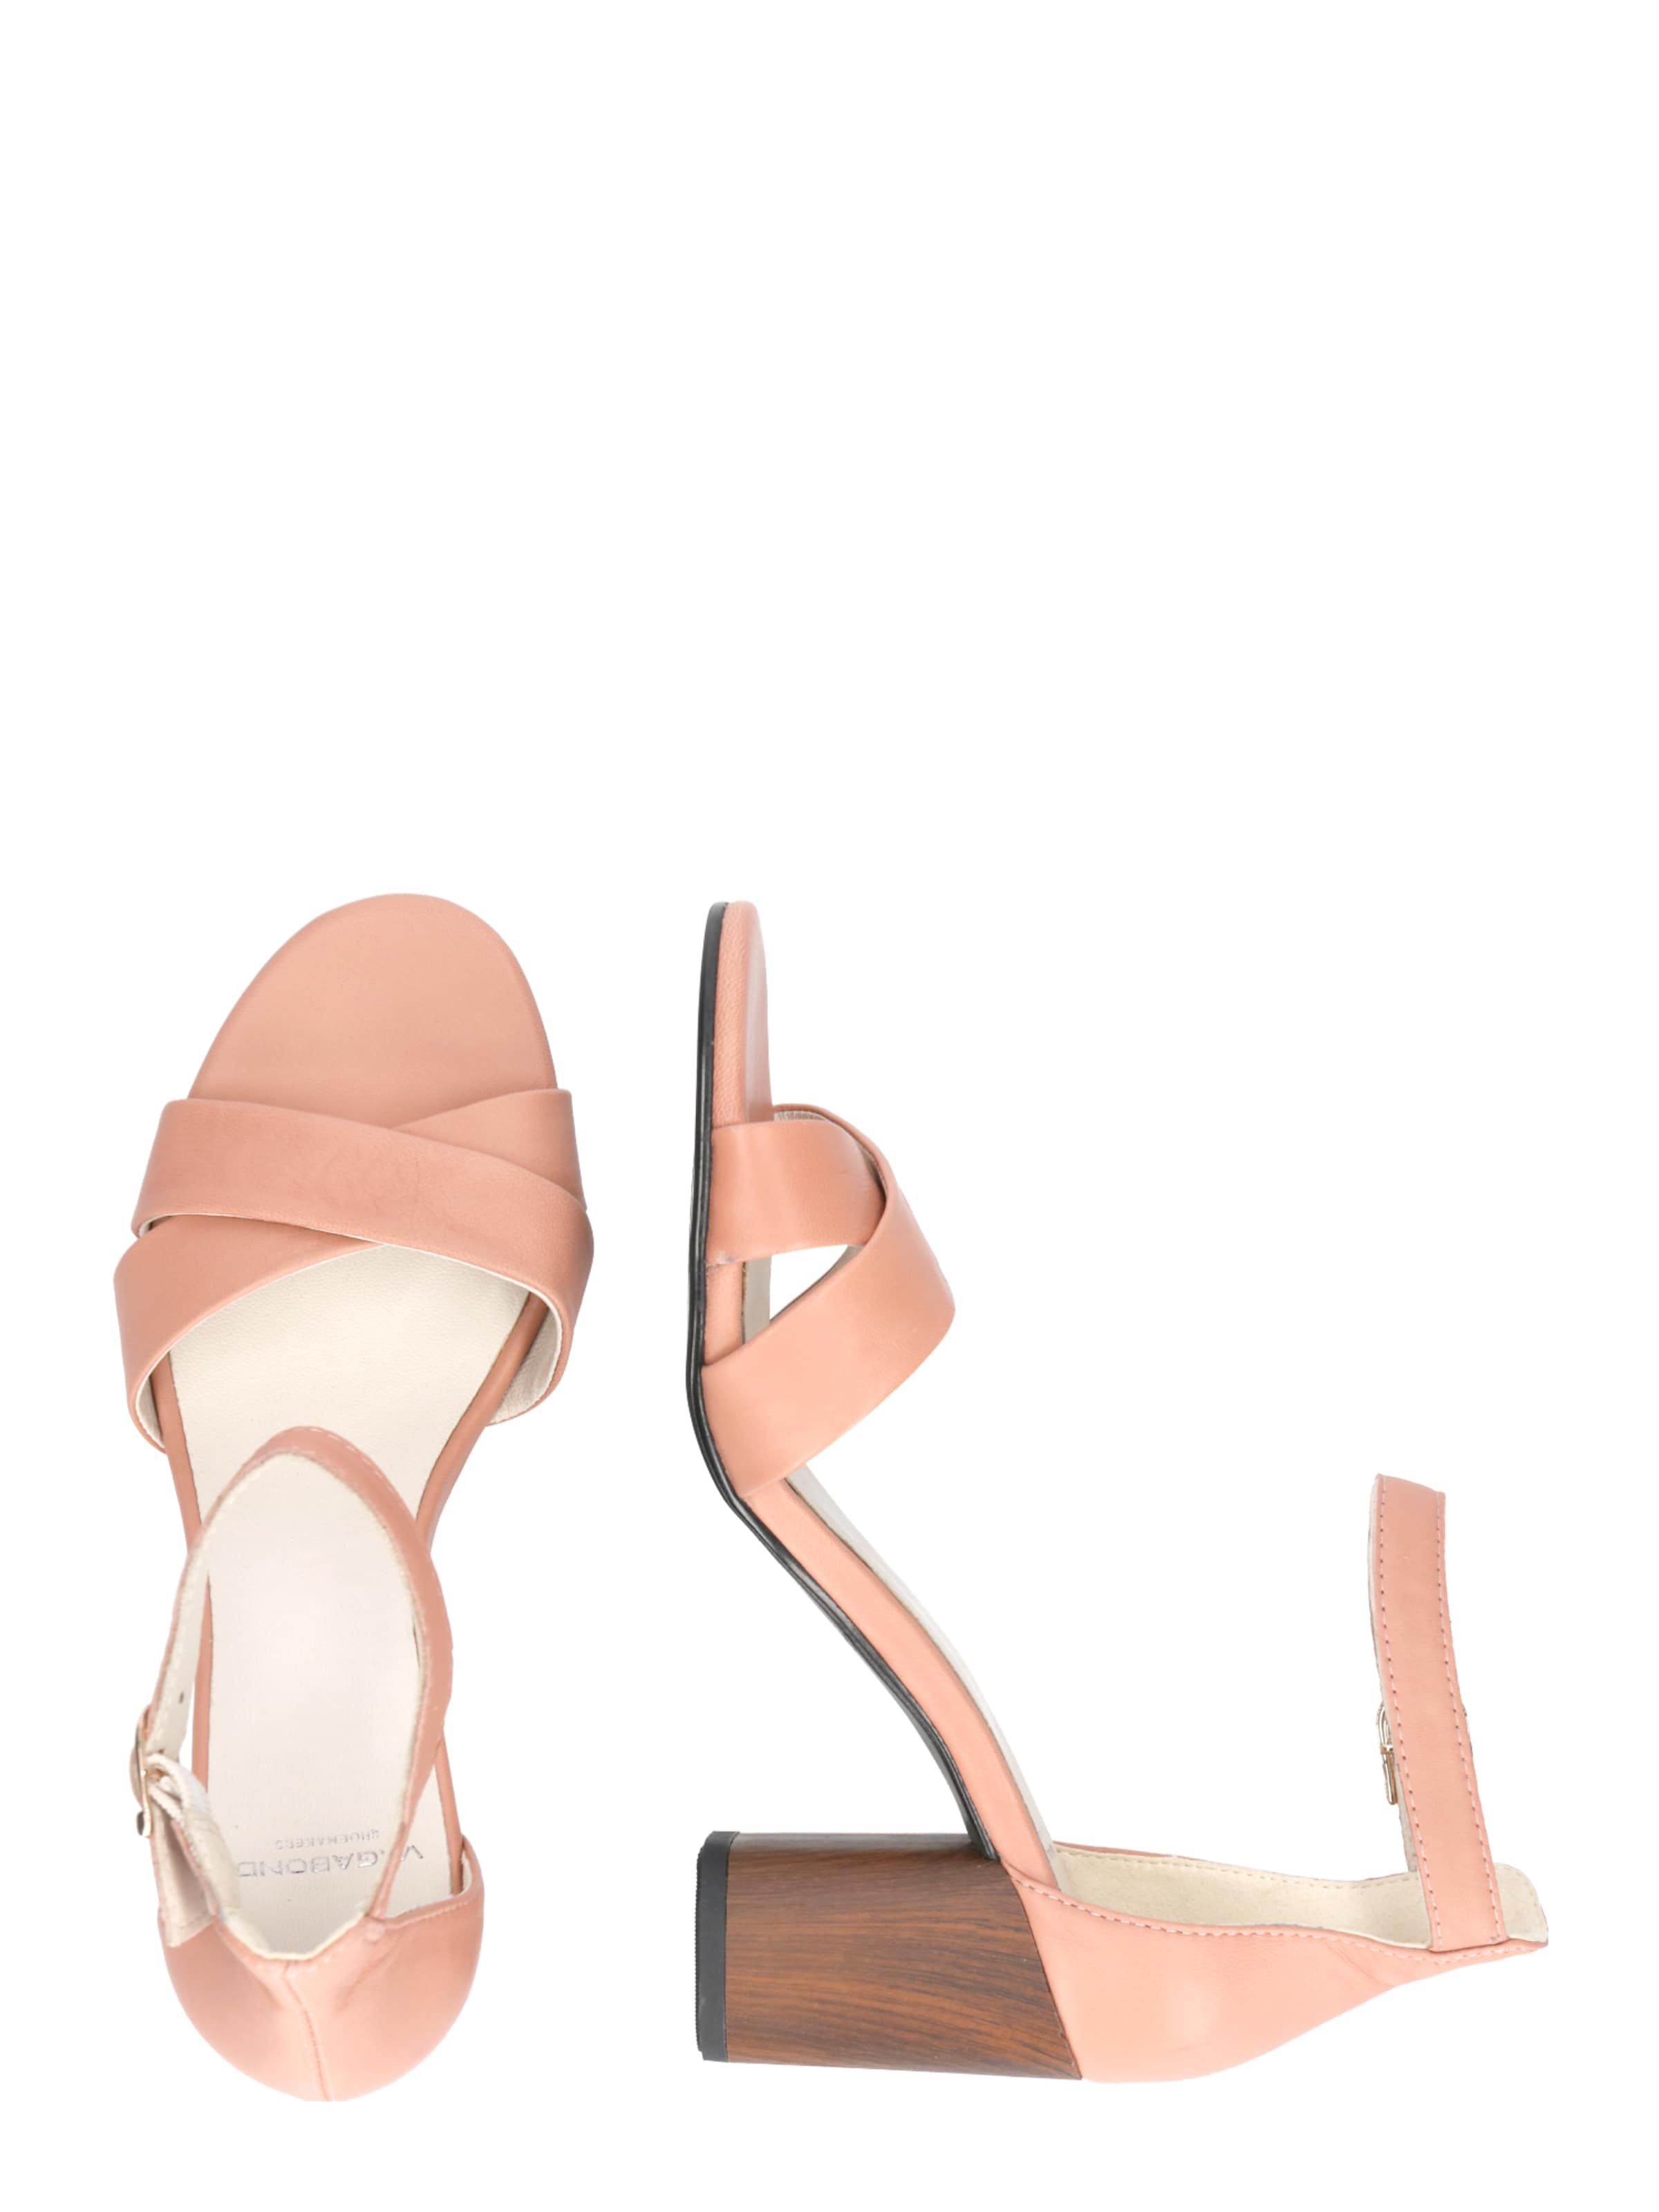 In Rosa Vagabond Sandalette Shoemakers 'carol' jLc5qR3A4